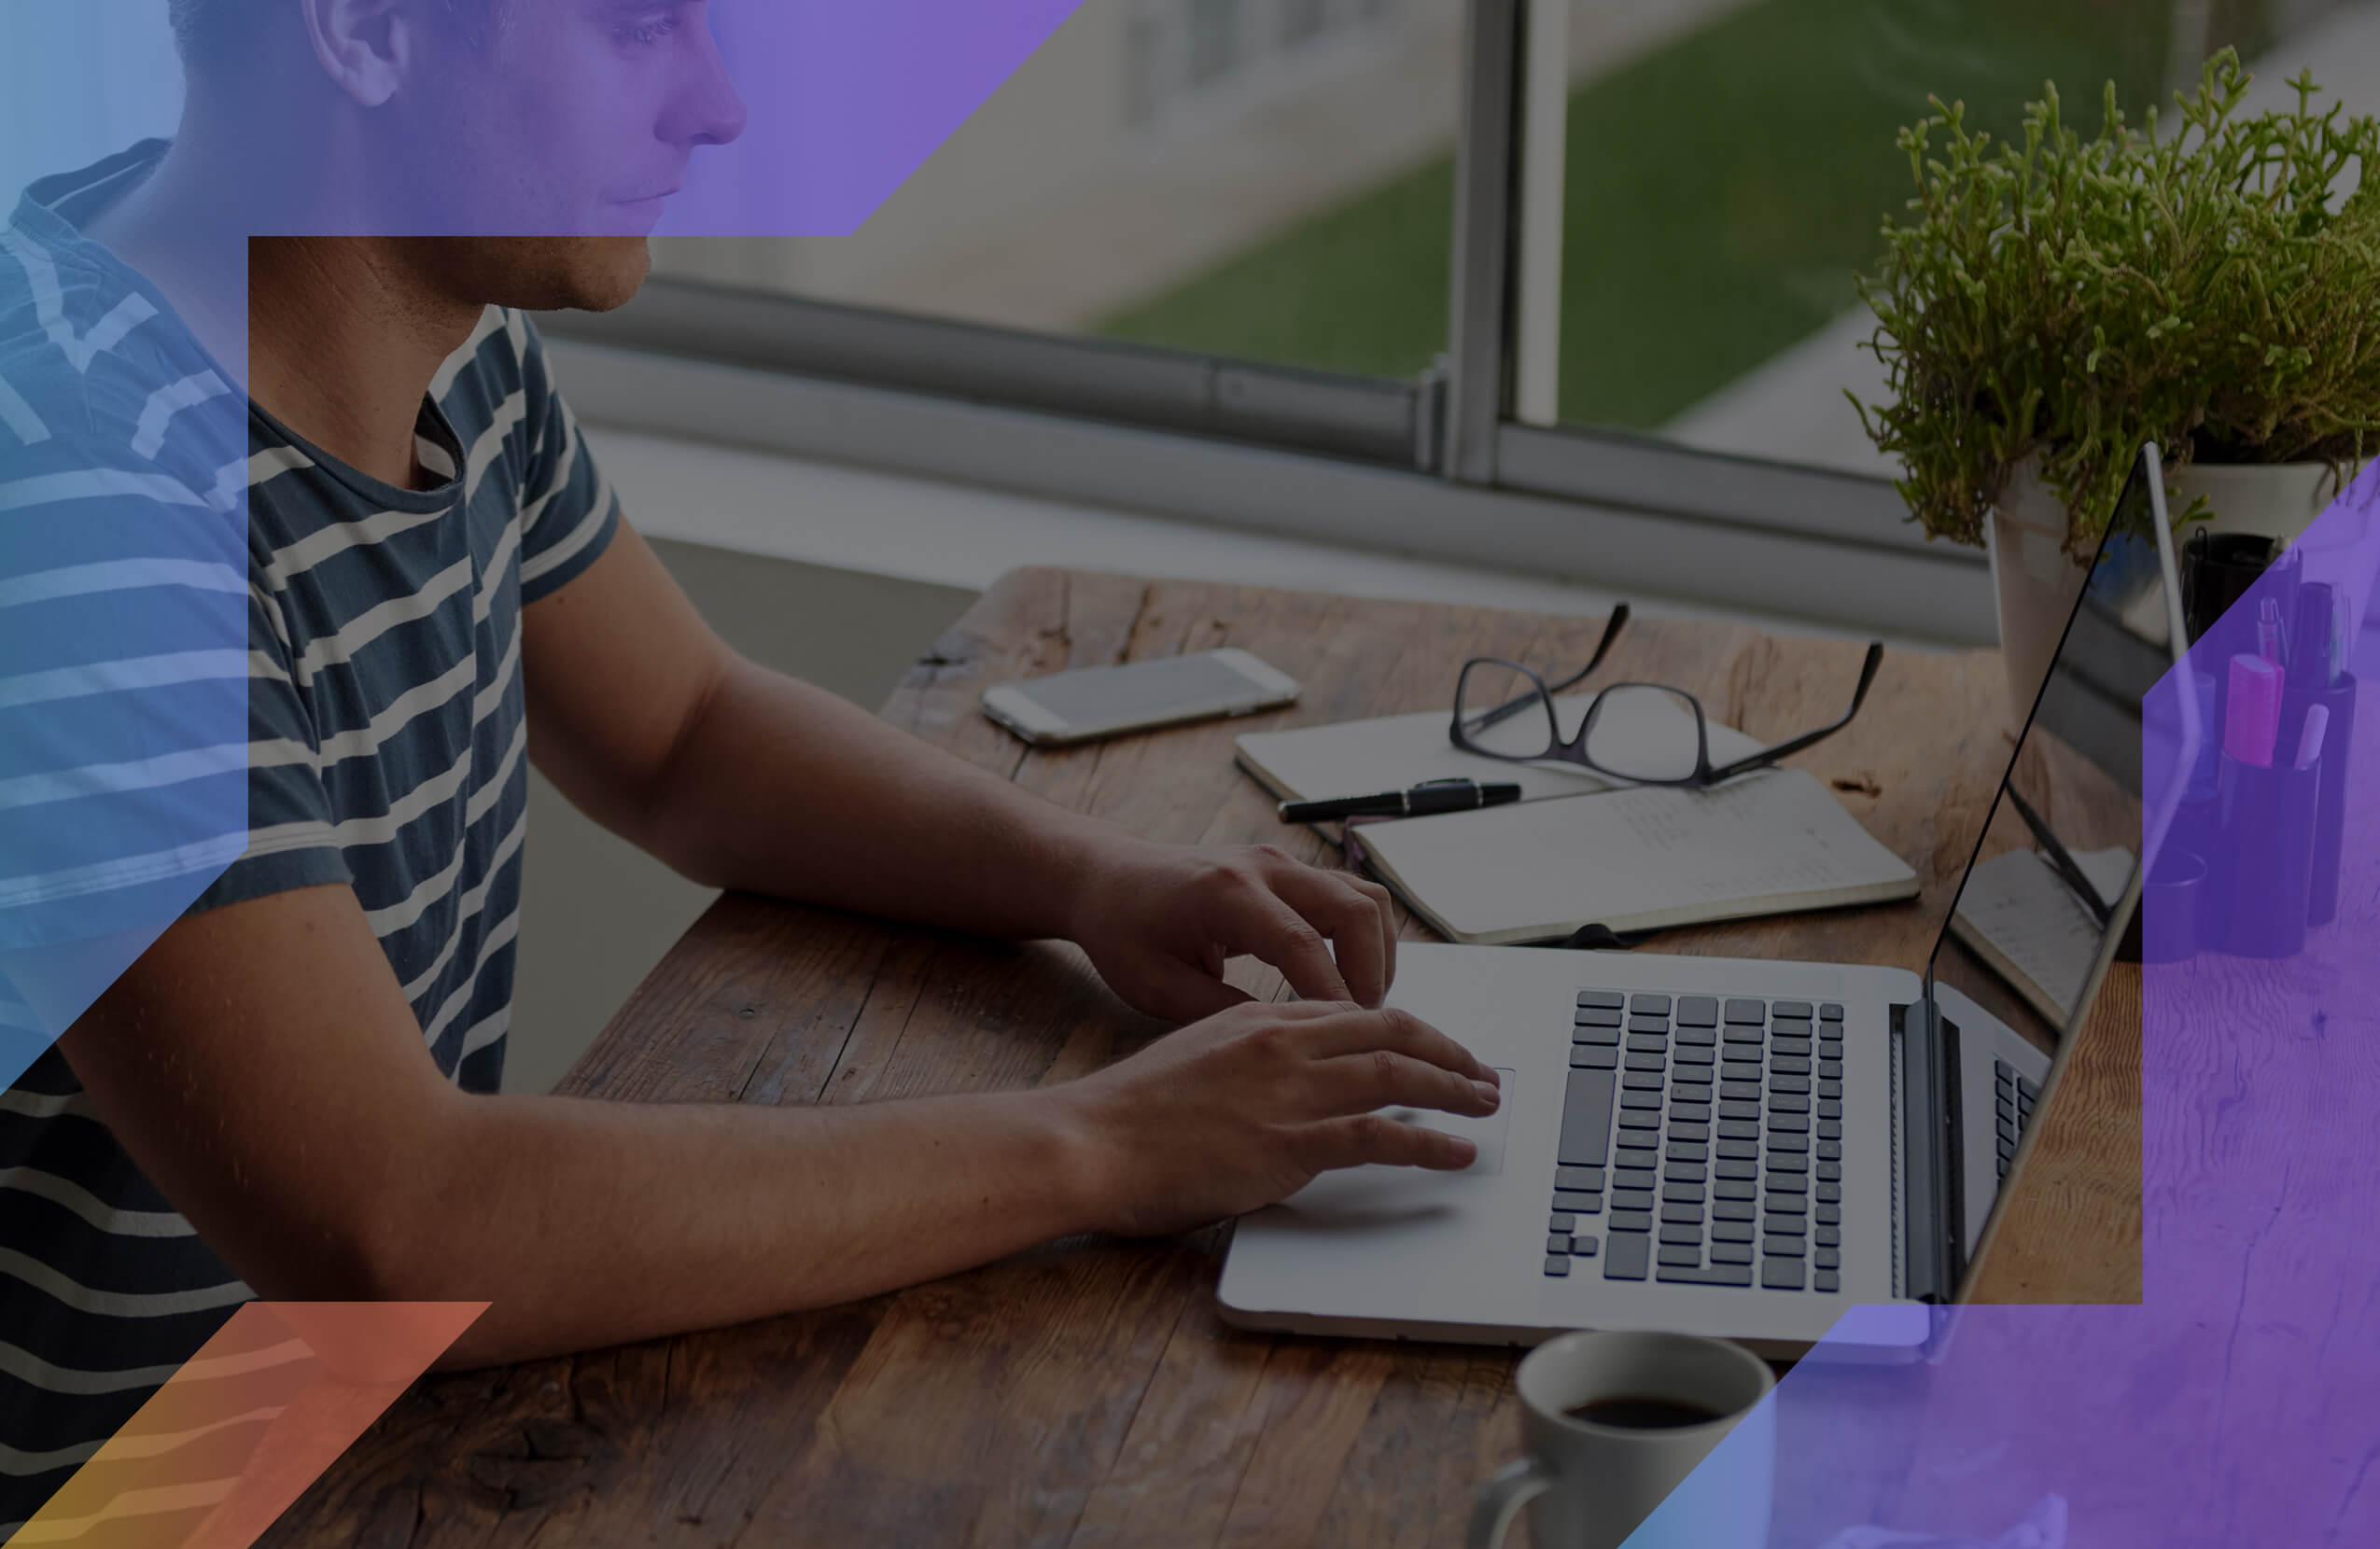 freelance blog writers featured image